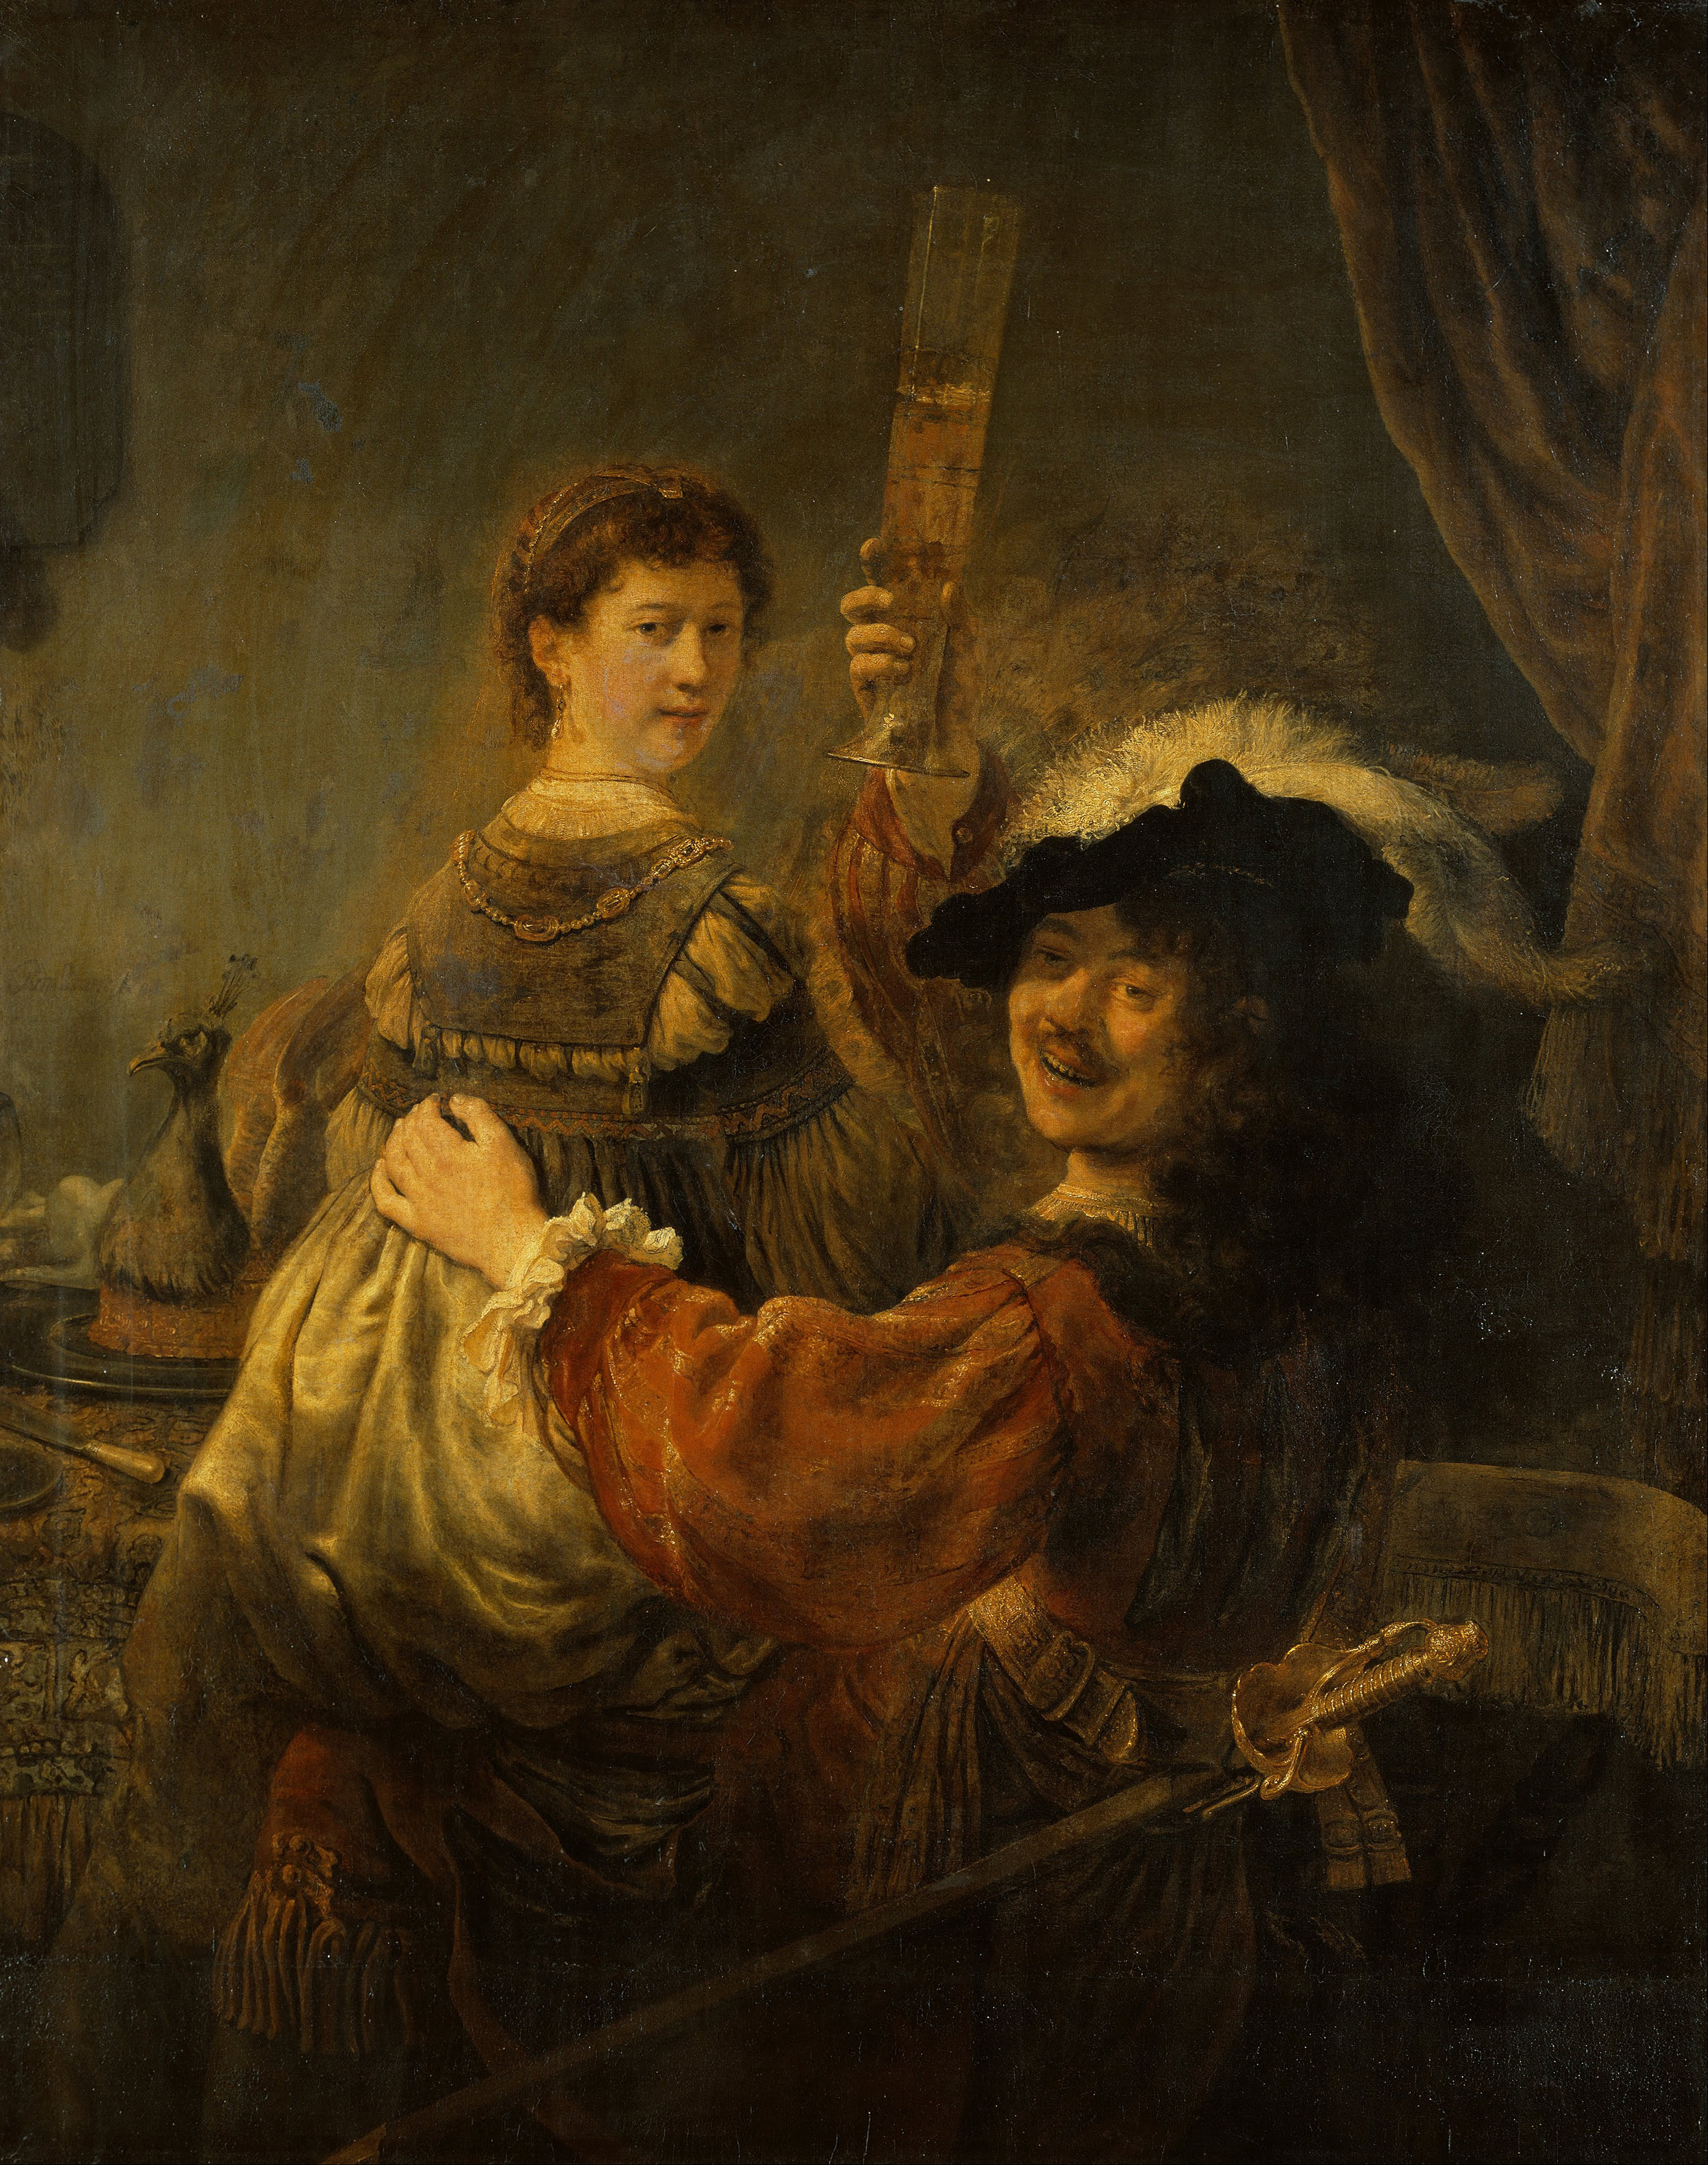 Rembrandt,  Prodigal Son in the Brothel  or  Rembrandt and Saskia in the parable of the prodigal son.  1635, Gemäldegalerie Alte Meister, Dresden.